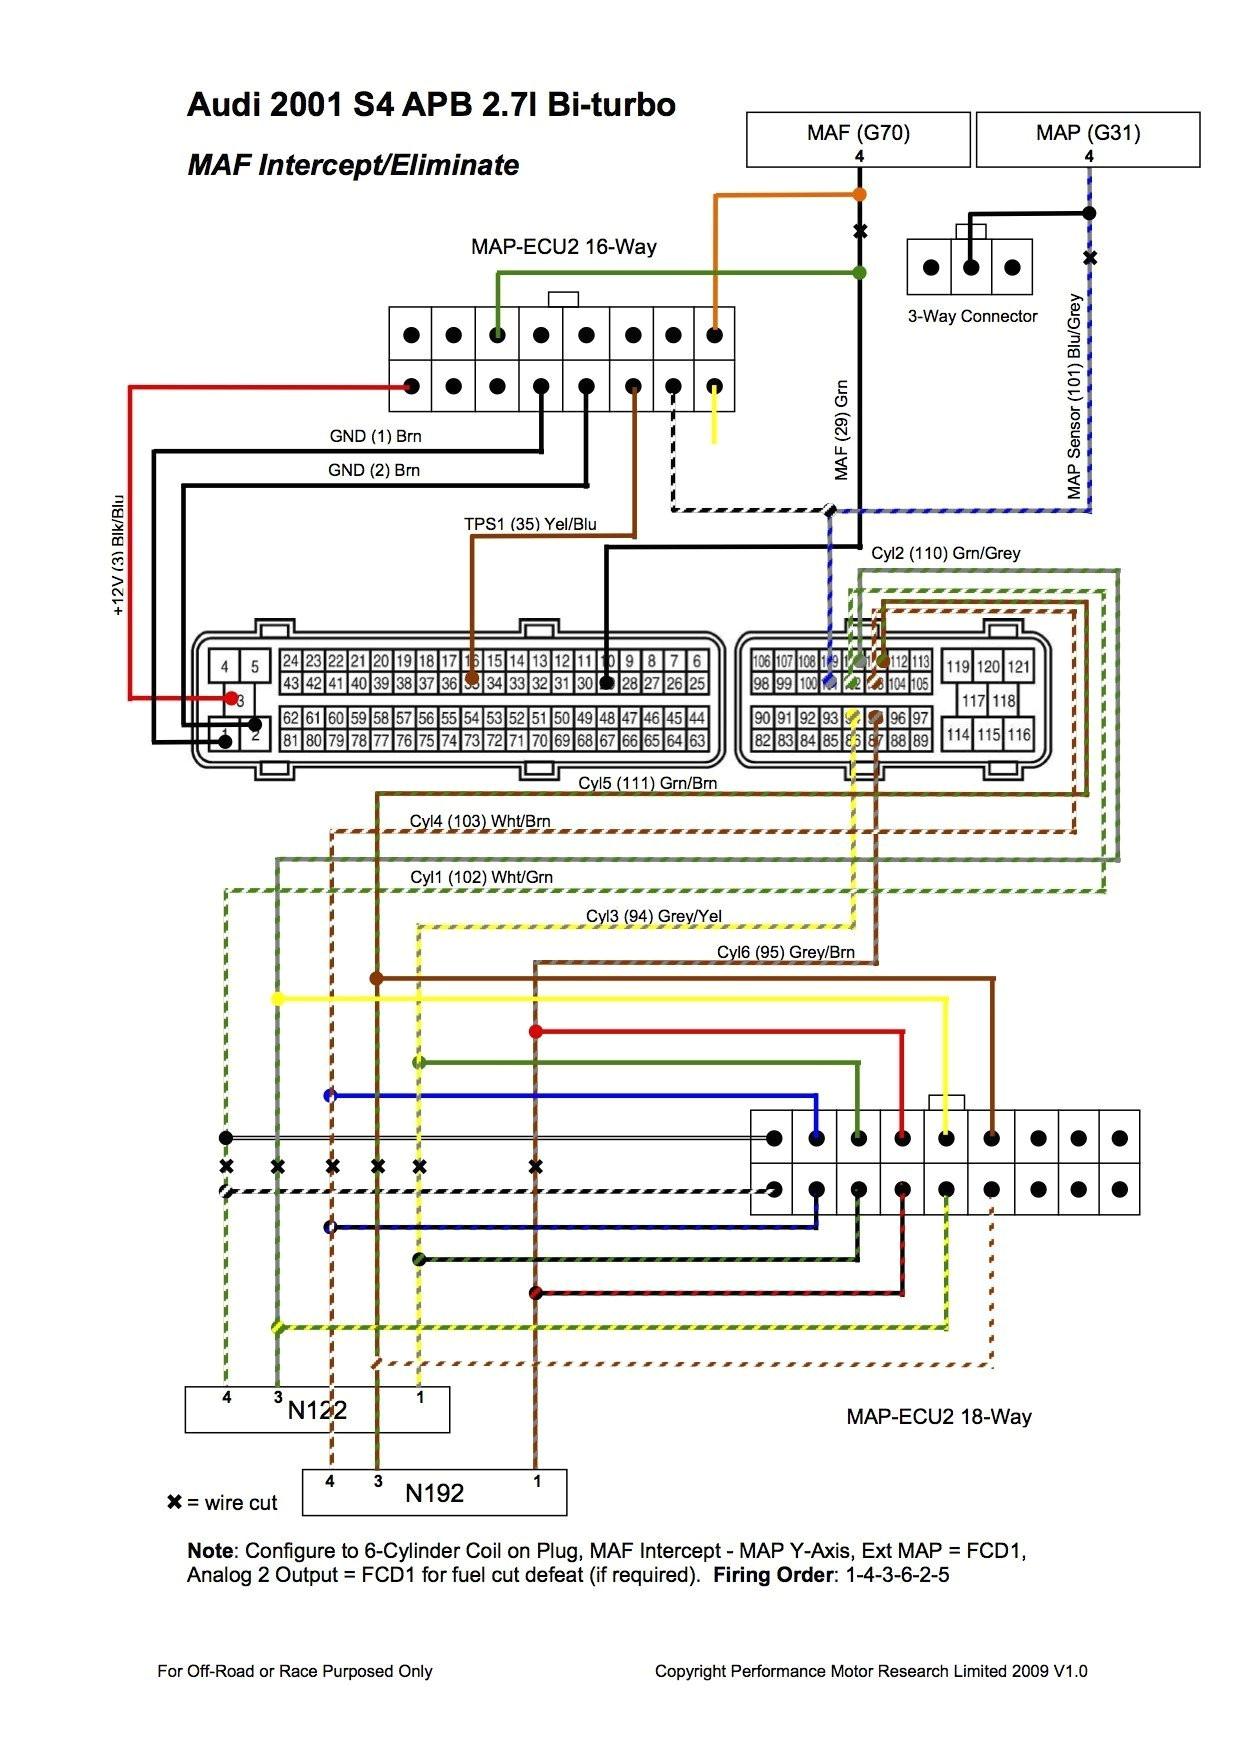 fiat punto 2001 wiring diagram wiring schematic 2019 u2022 rh digitrading co 2001 infiniti qx4 wiring